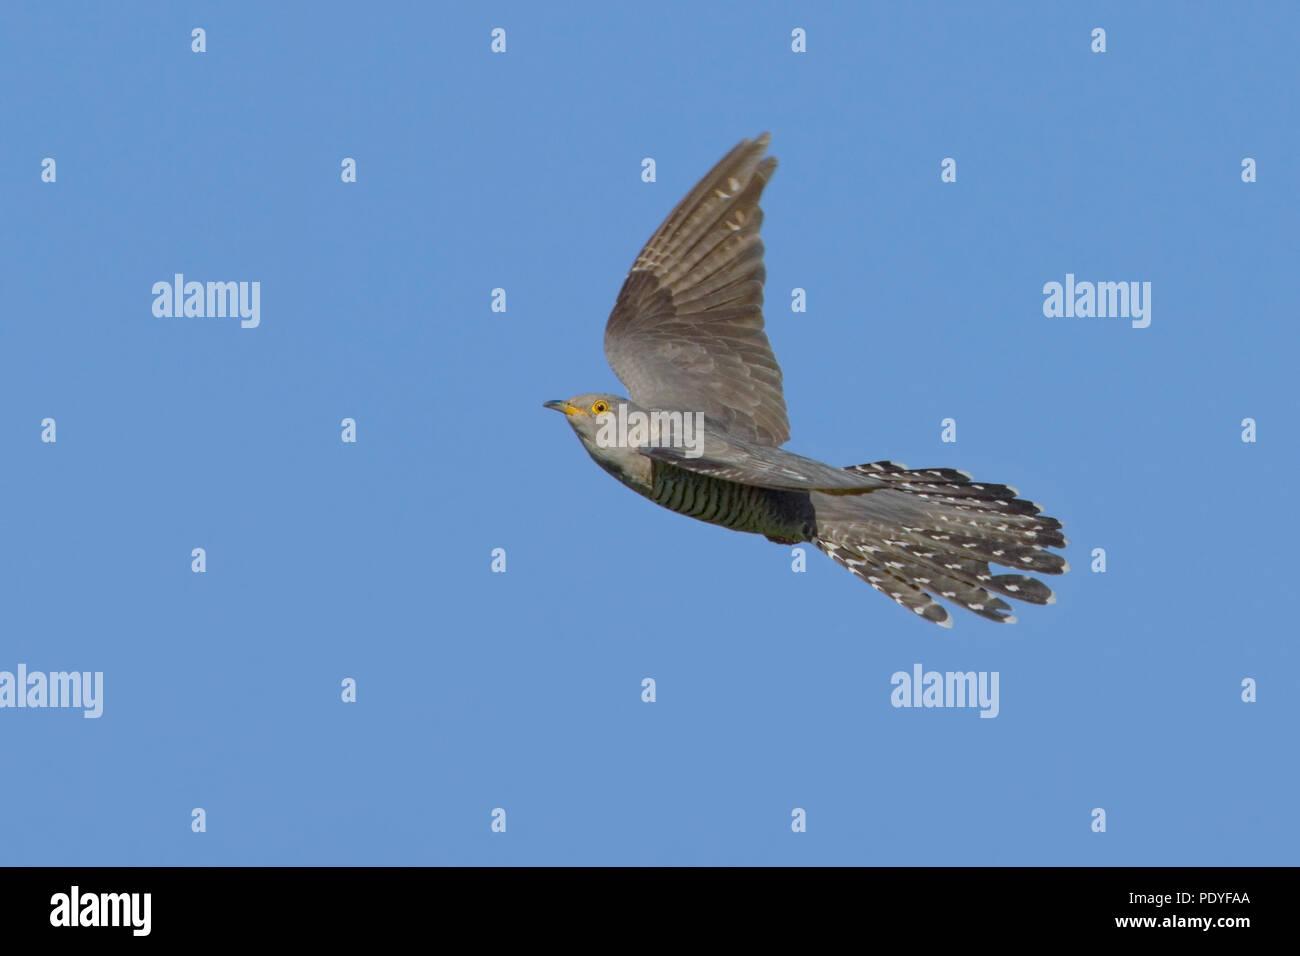 flying Cuckoo against blue sky Stock Photo